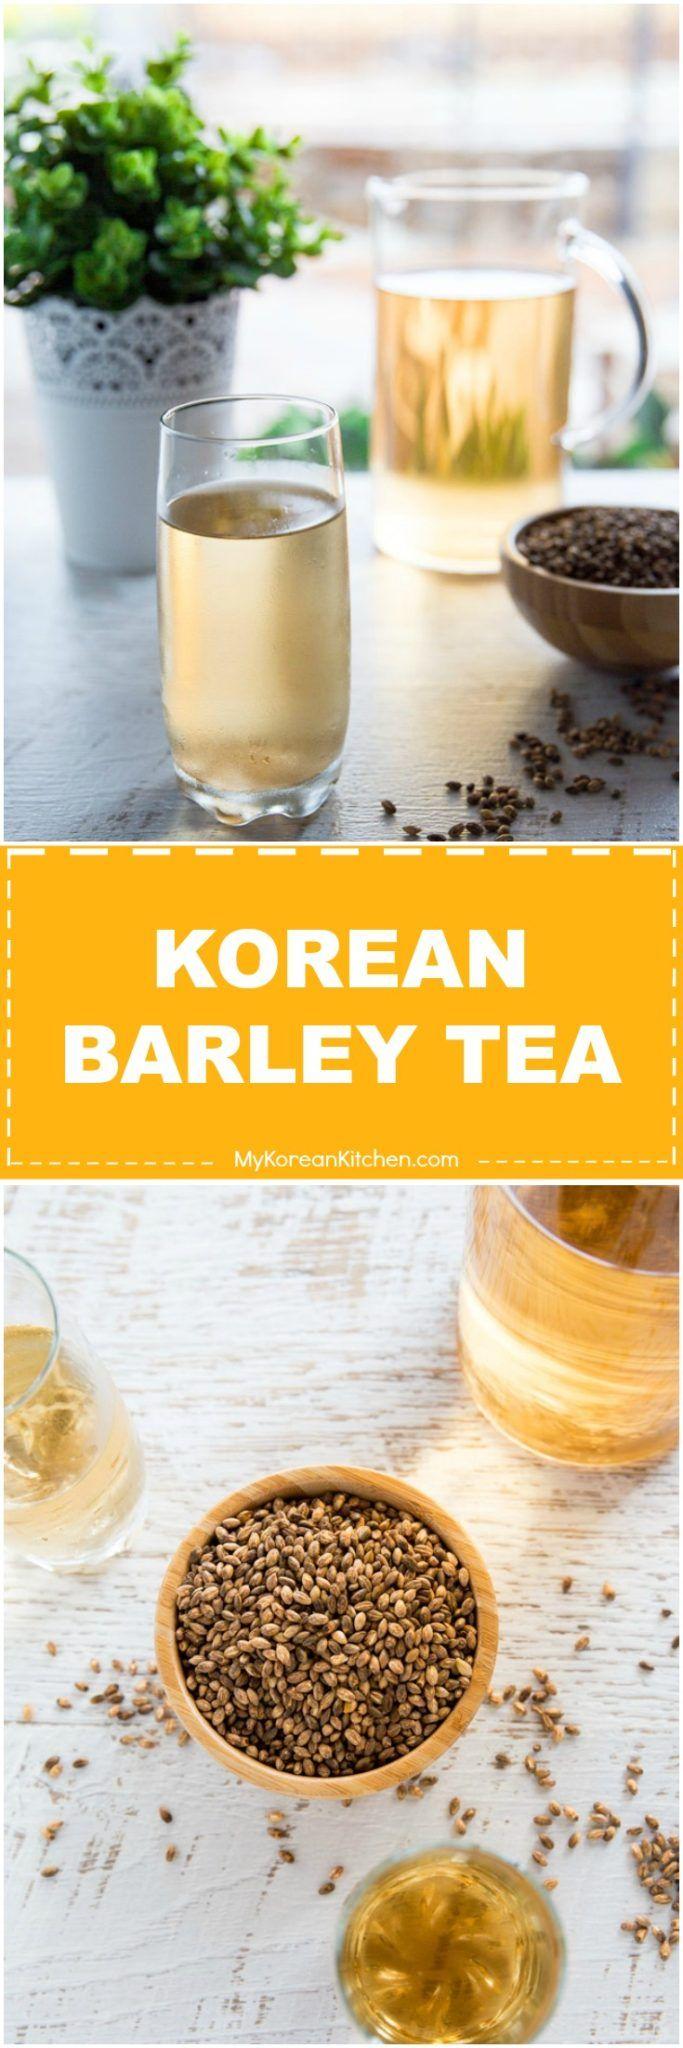 How to make Korean barley tea (boricha). Korean barley tea is a popular water alternative in Korea. It has nice nutty flavor and slightly sweet taste. | MyKoreanKitchen.com via @mykoreankitchen